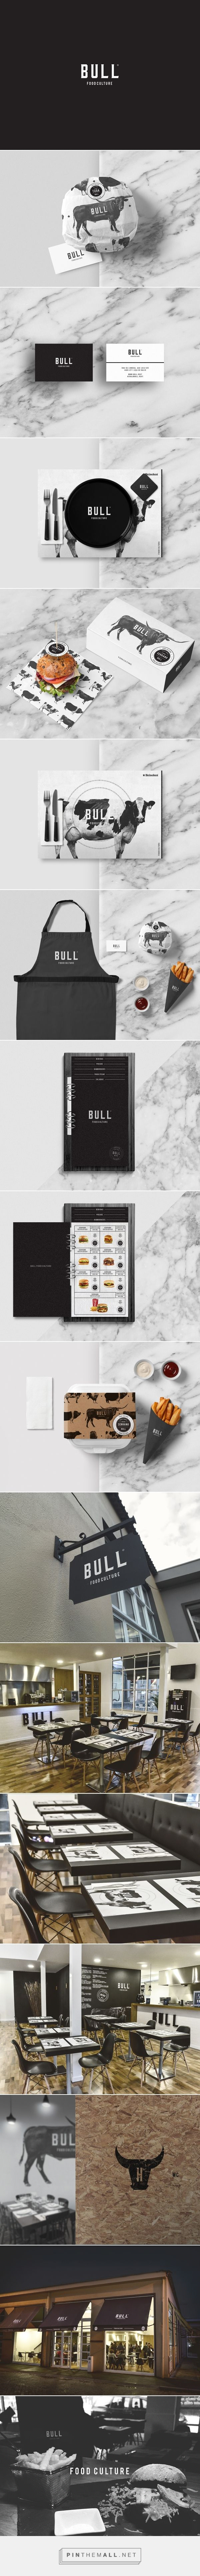 bull food culture restaurant branding and menu design by bullseye fivestar branding agency design: room manchester menu design mdog